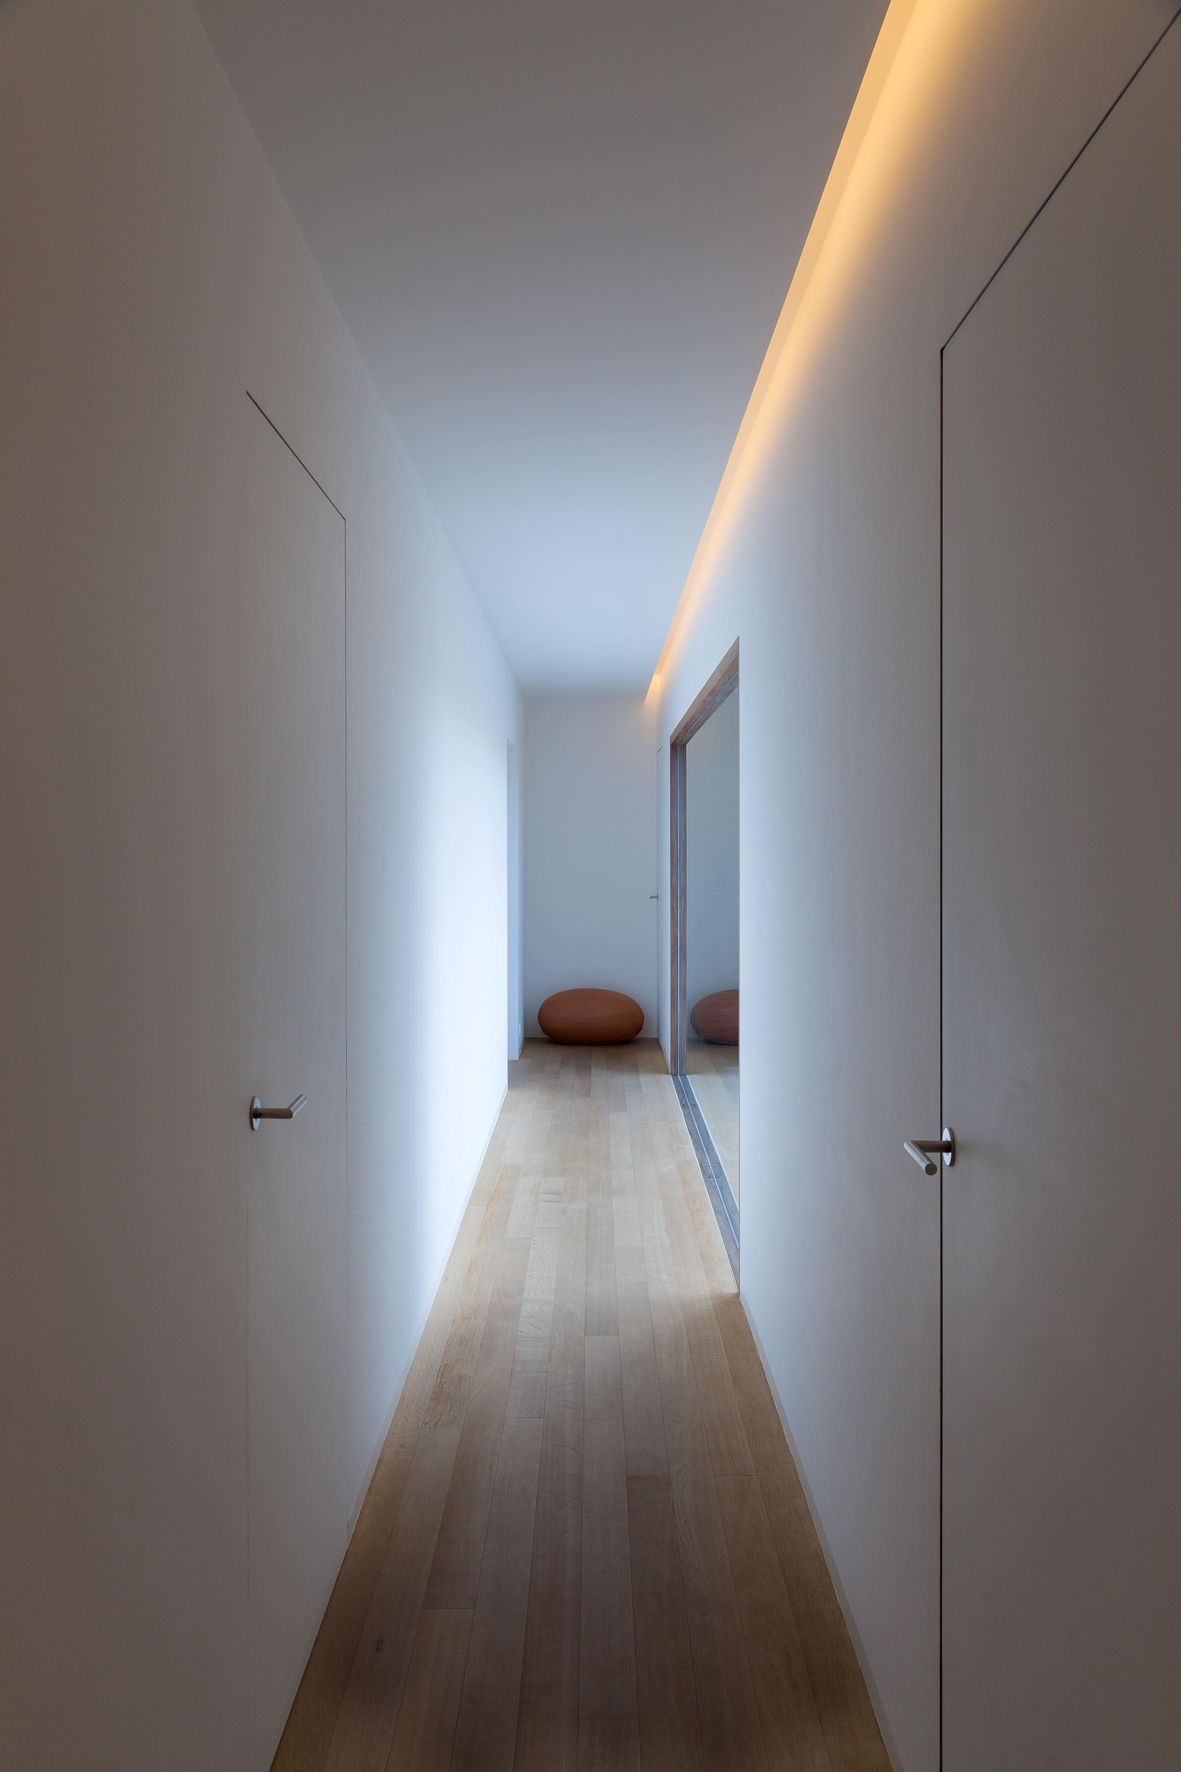 Pin de ani centeno en iiuminaci n radita puertas for Iluminacion minimalista interiores